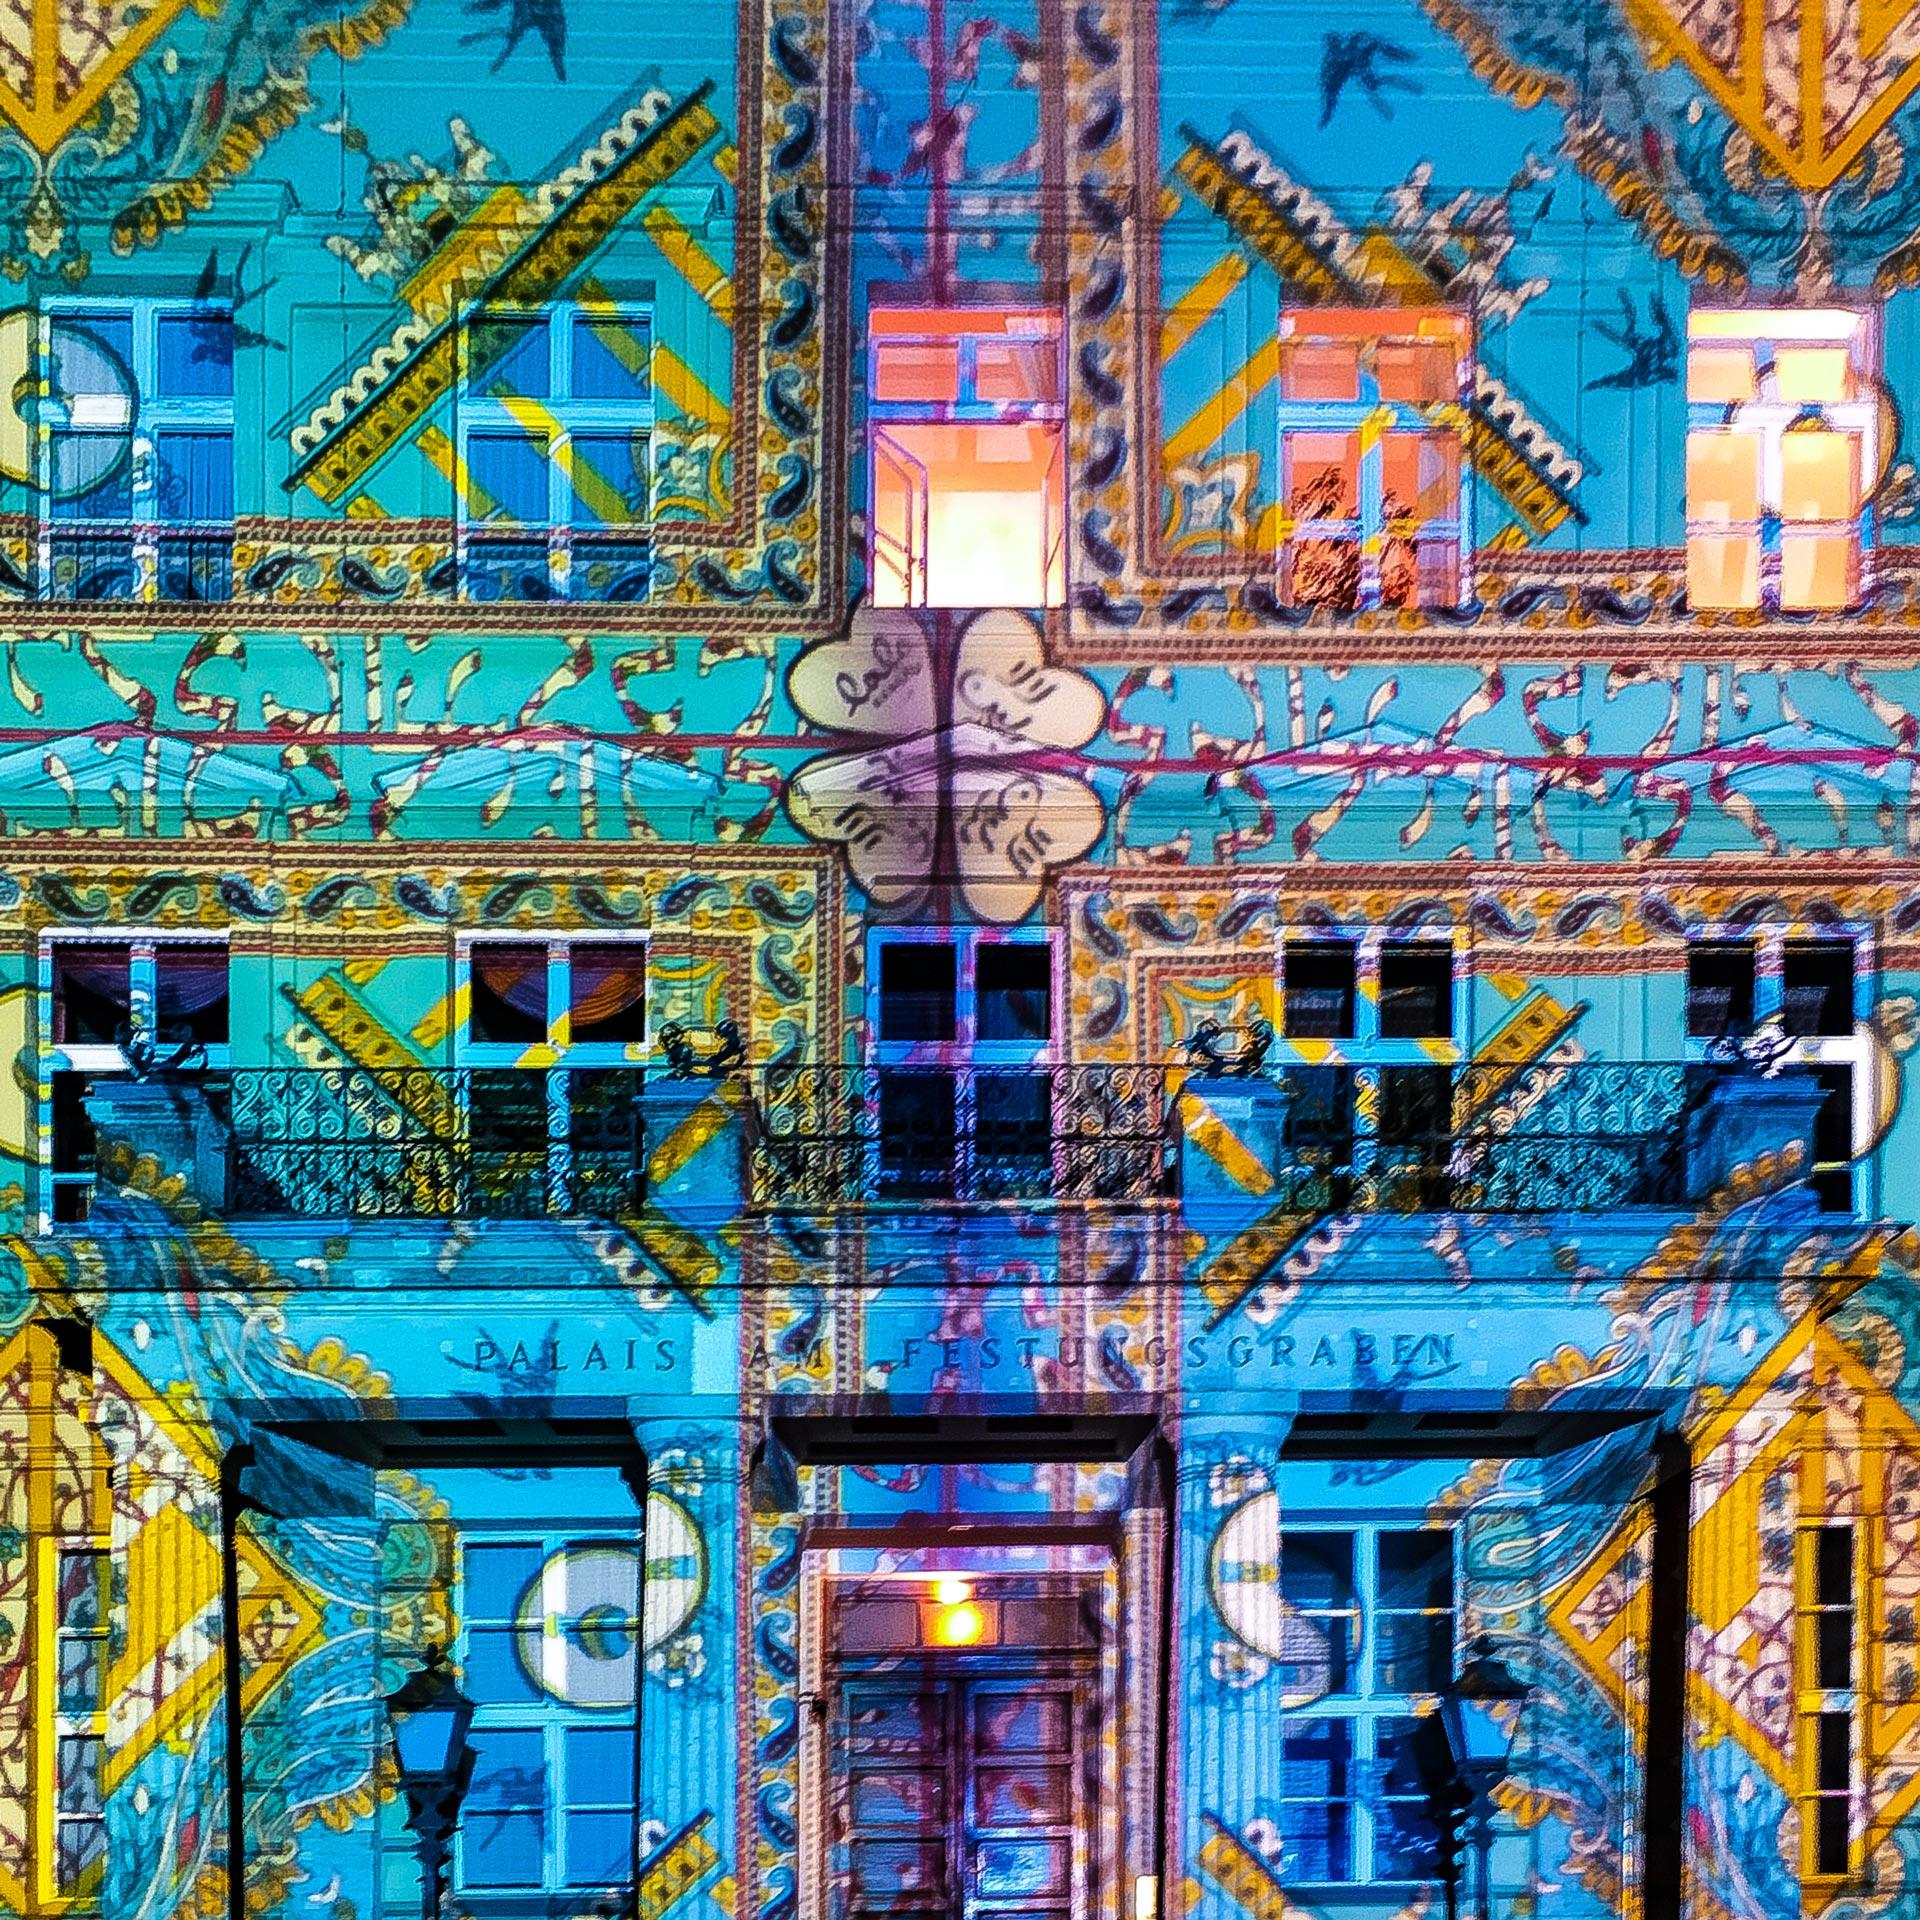 Festival of Lights 2017: Spanien trifft beim Palais am Festungsgraben auf Berlin